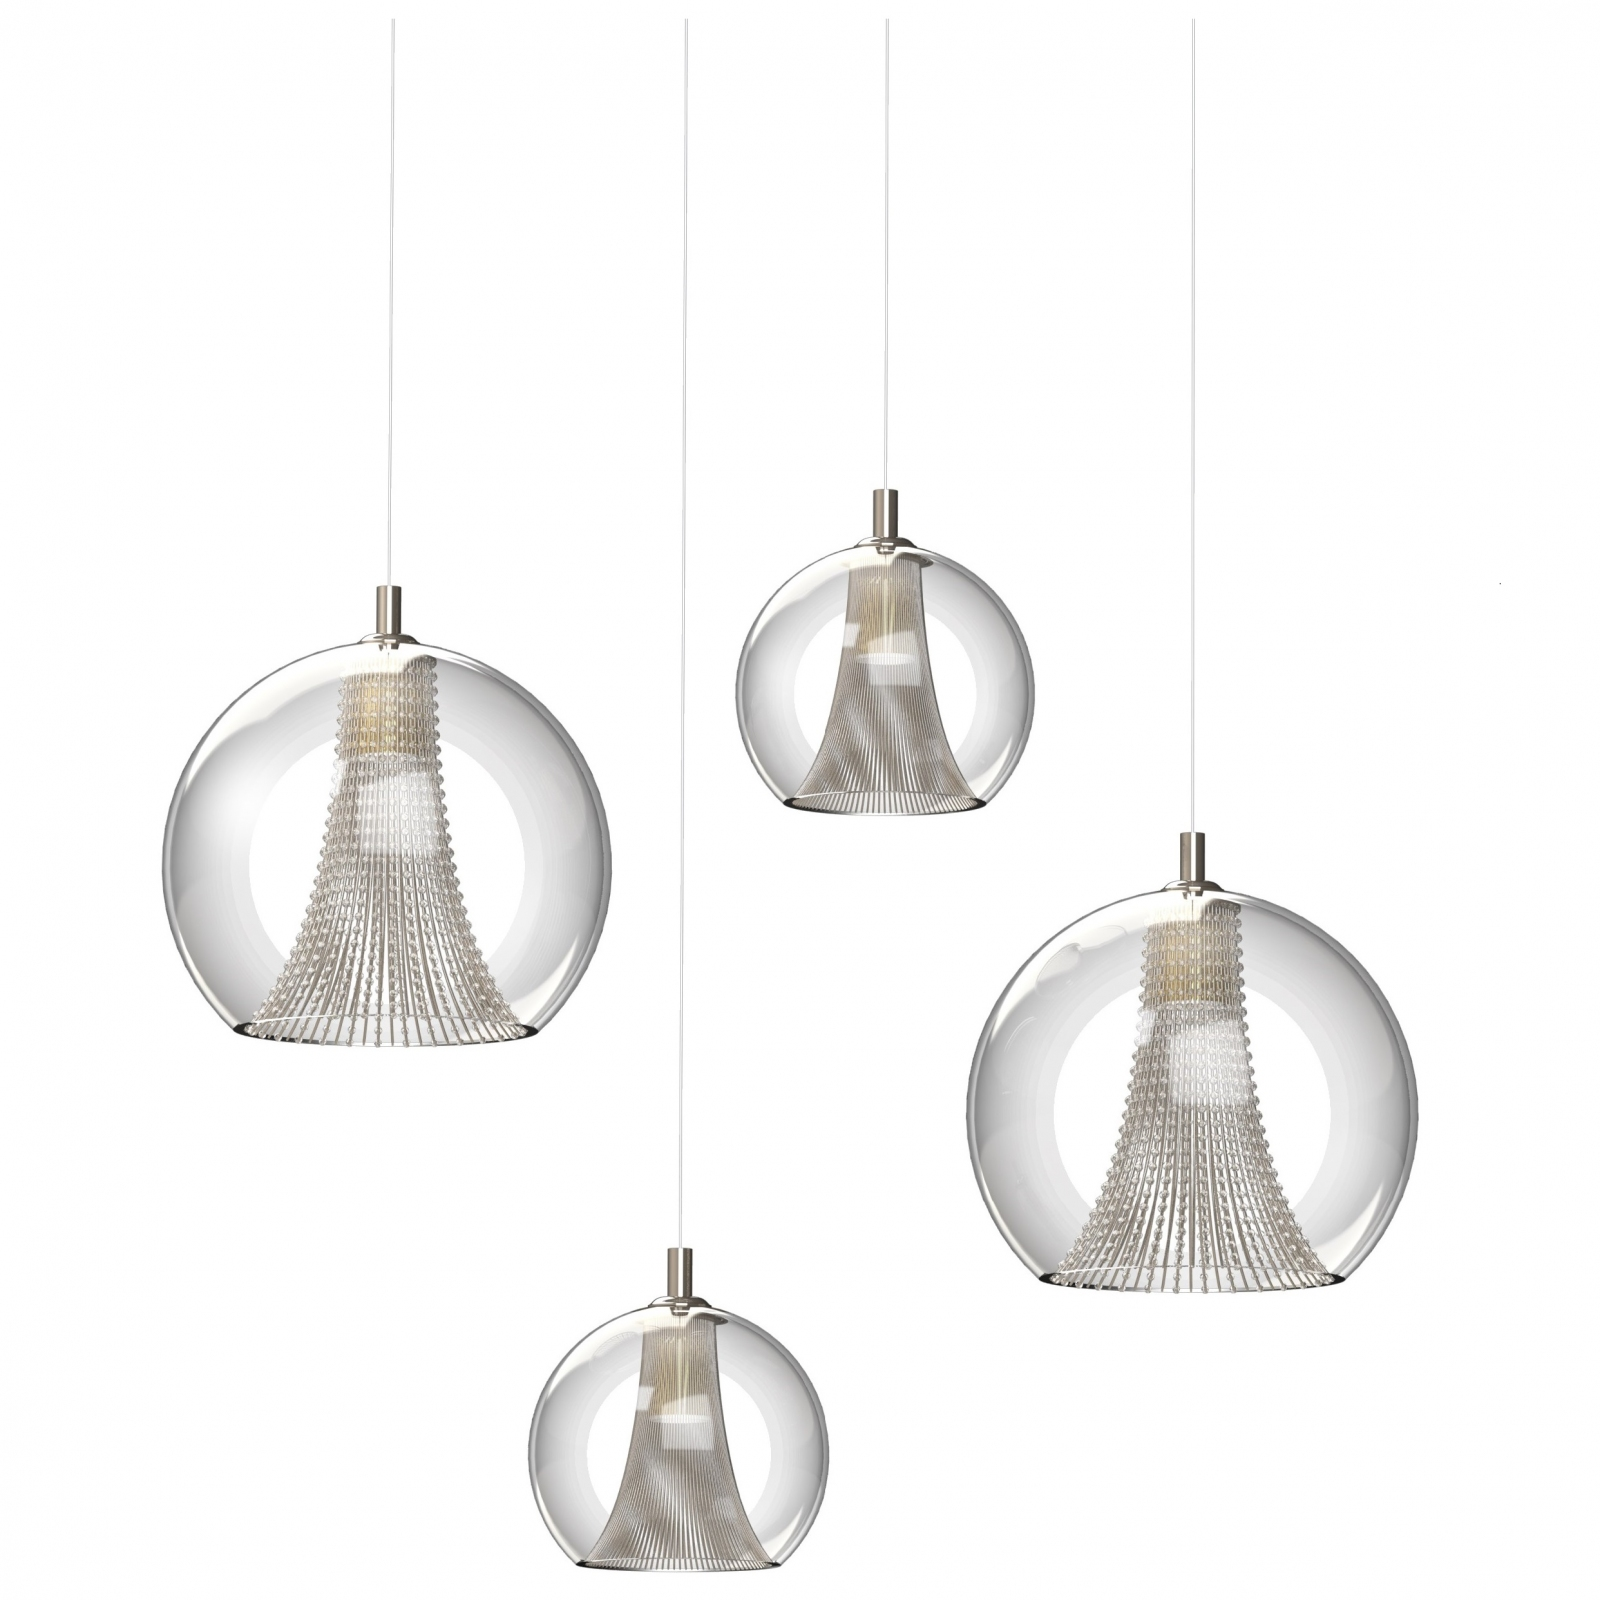 appareils d 39 clairage calicem i lumi res et lampes en suisse artglass. Black Bedroom Furniture Sets. Home Design Ideas